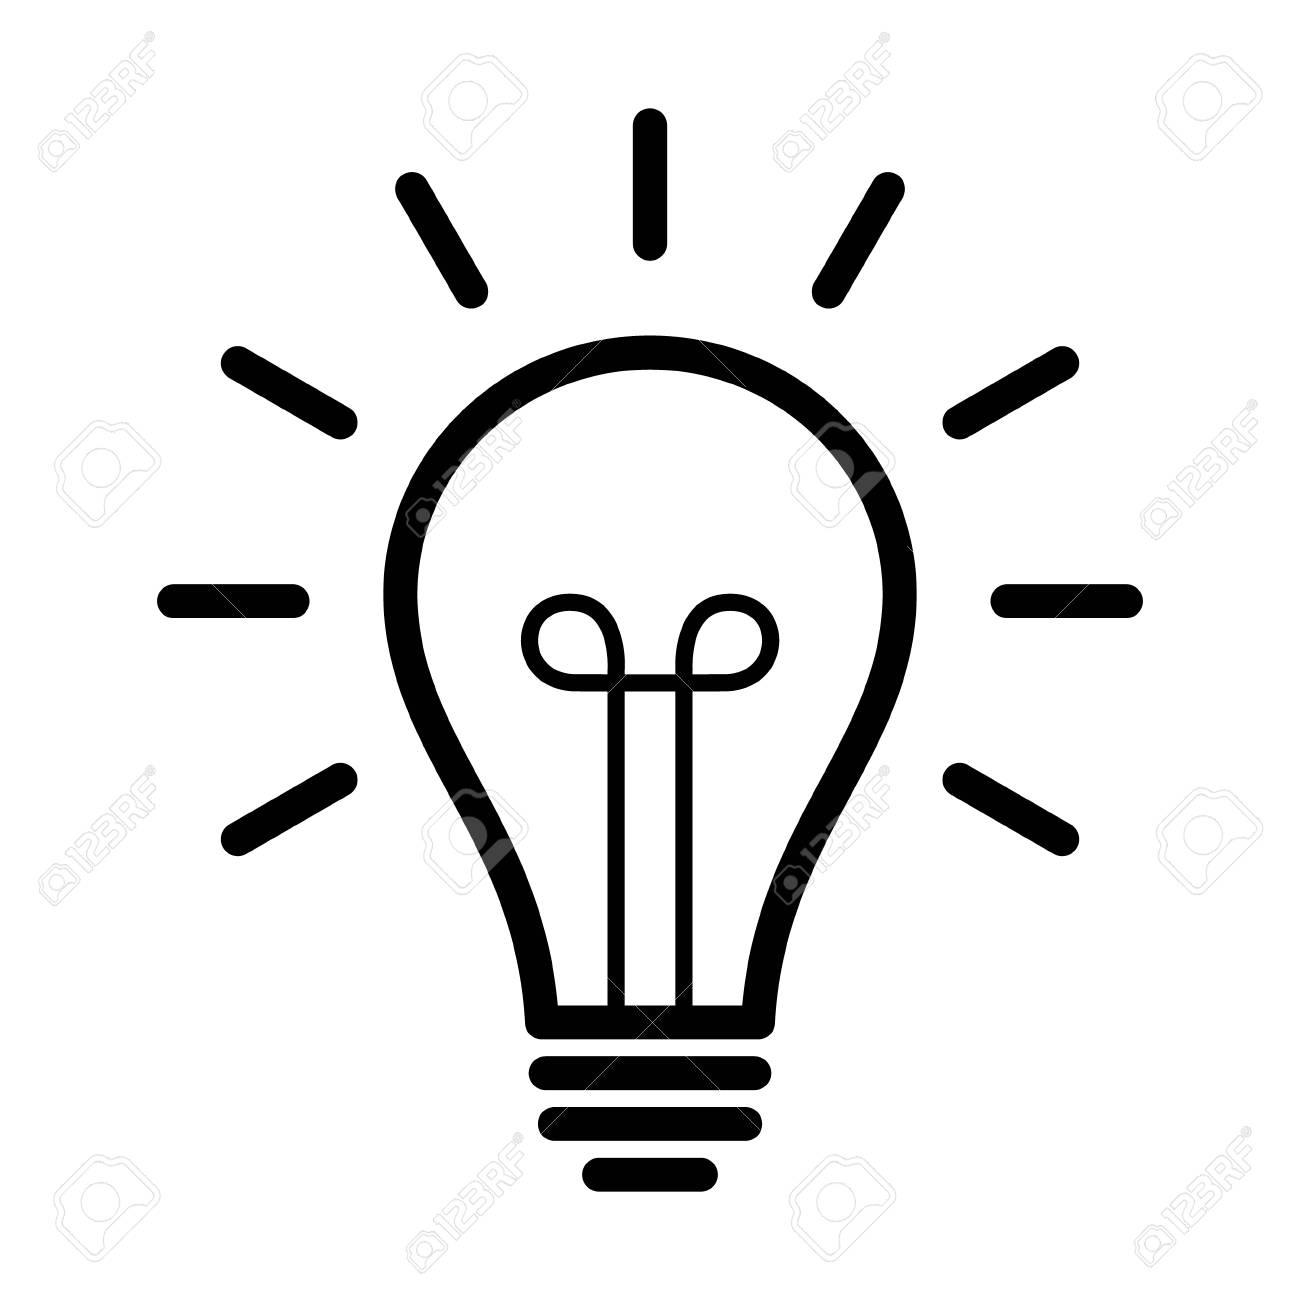 Vintage Light Bulb Lightbulb Turned On Or Idea Line Art Icon For Apps And Websites